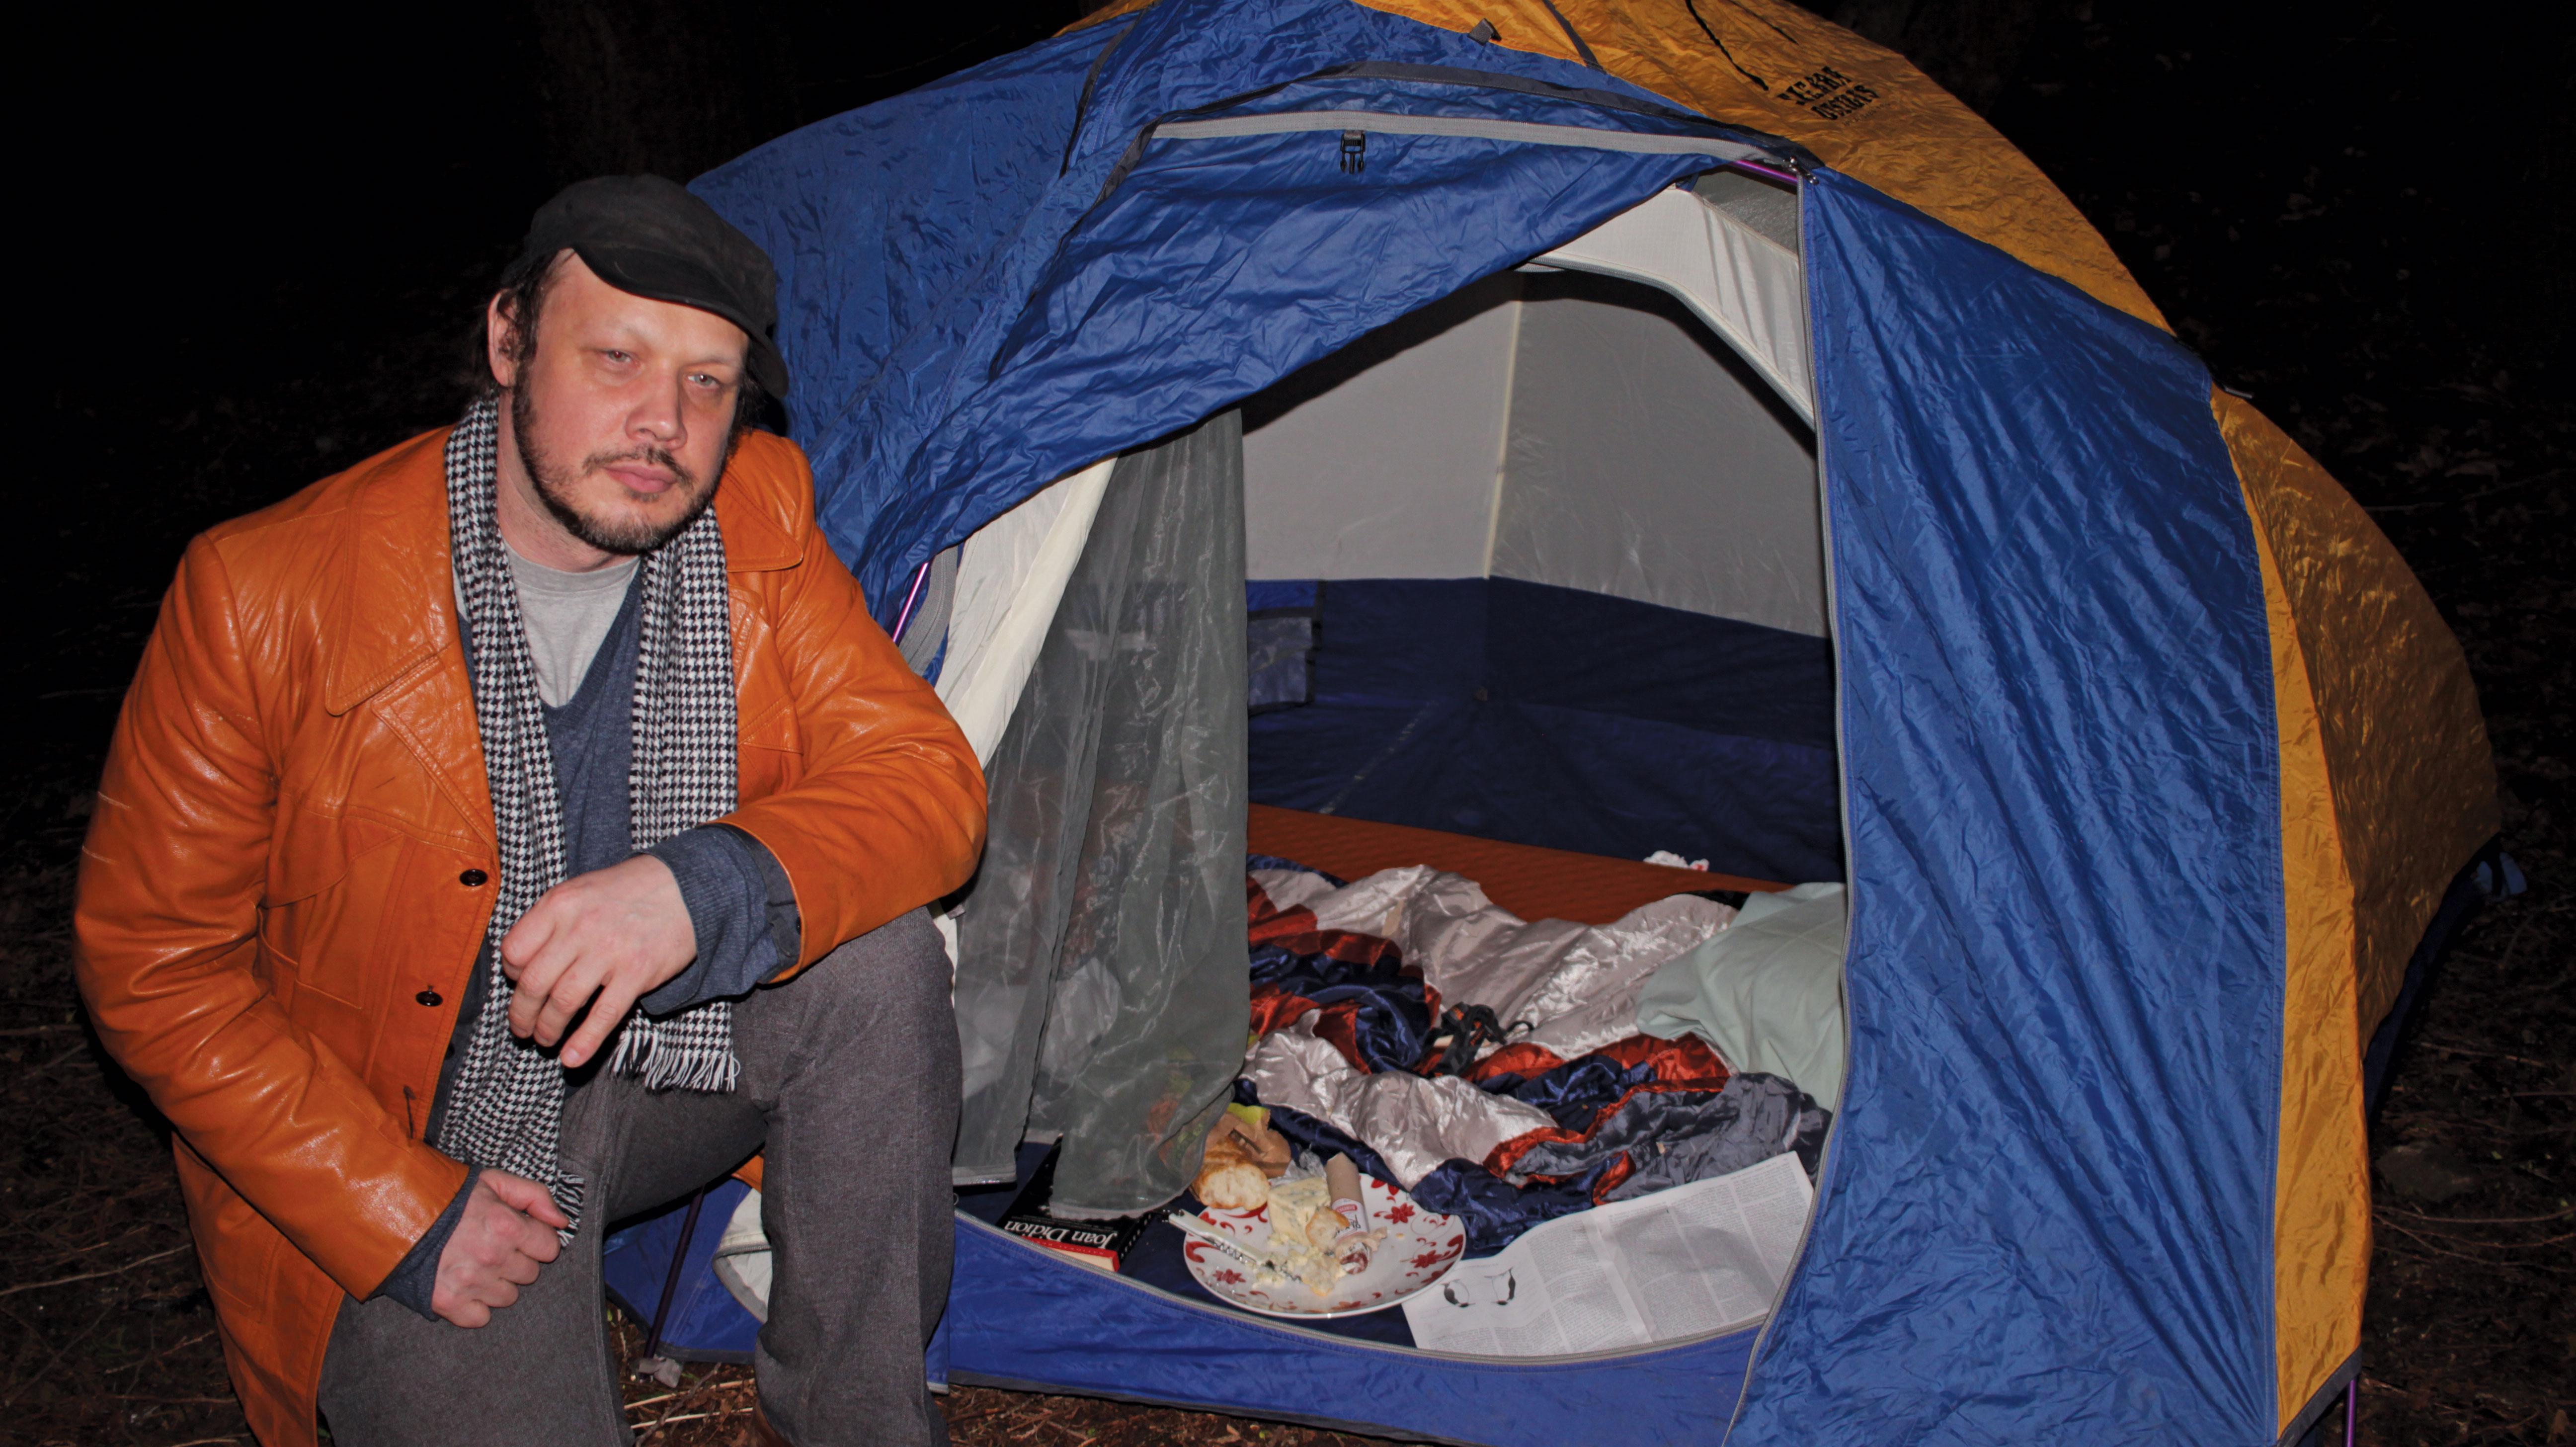 MatthewKorfhage_camping_news_AndrewKoczian